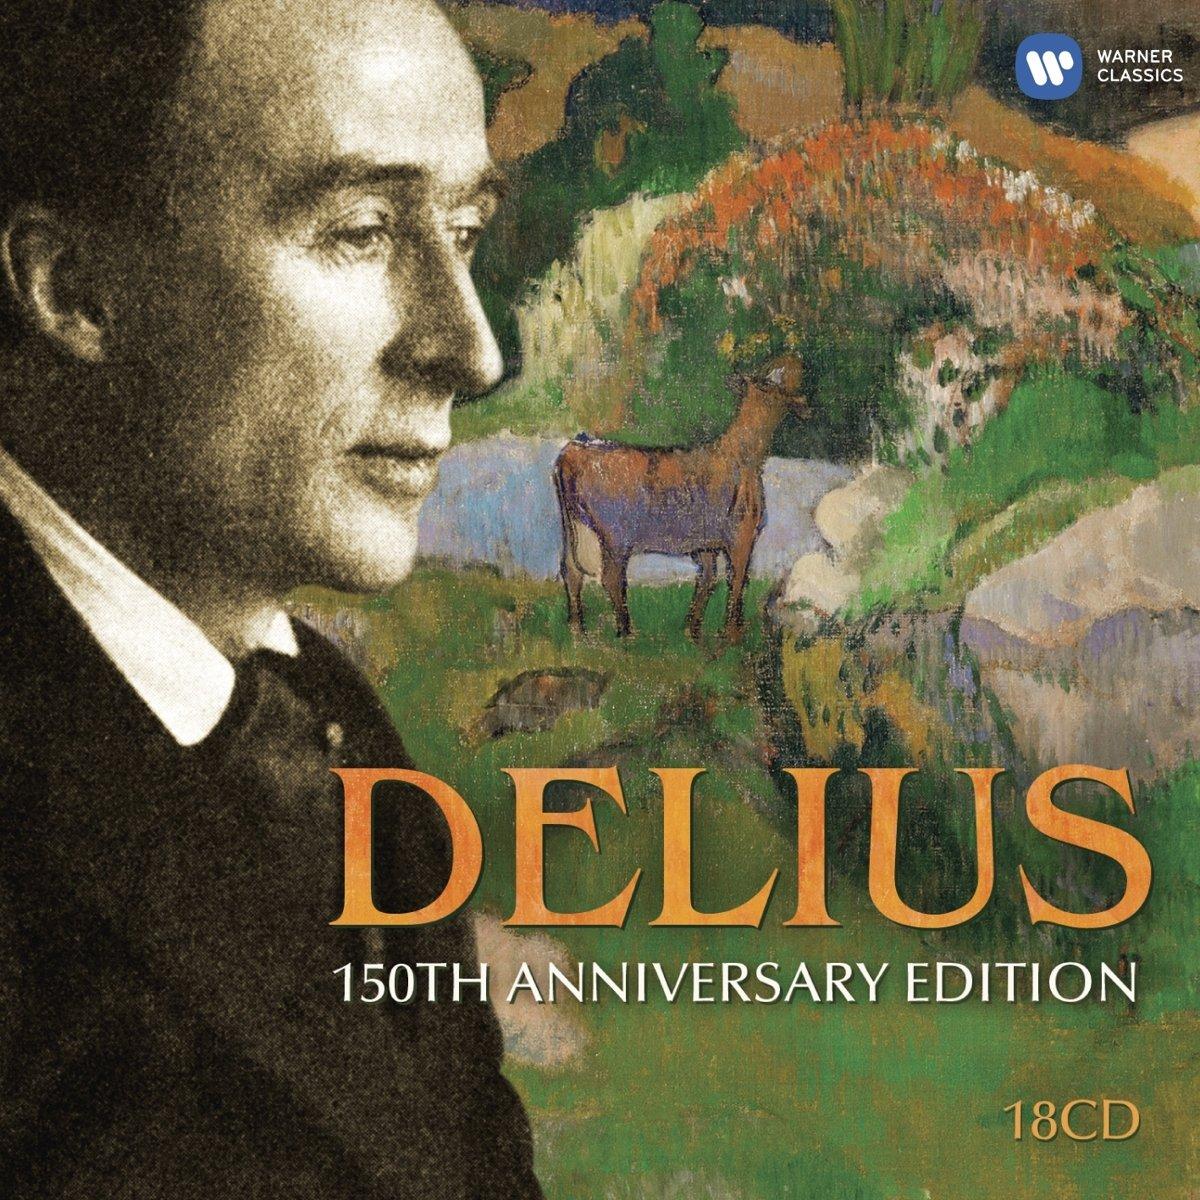 Delius Box: 150th Anniversary Edition by Warner Bros.